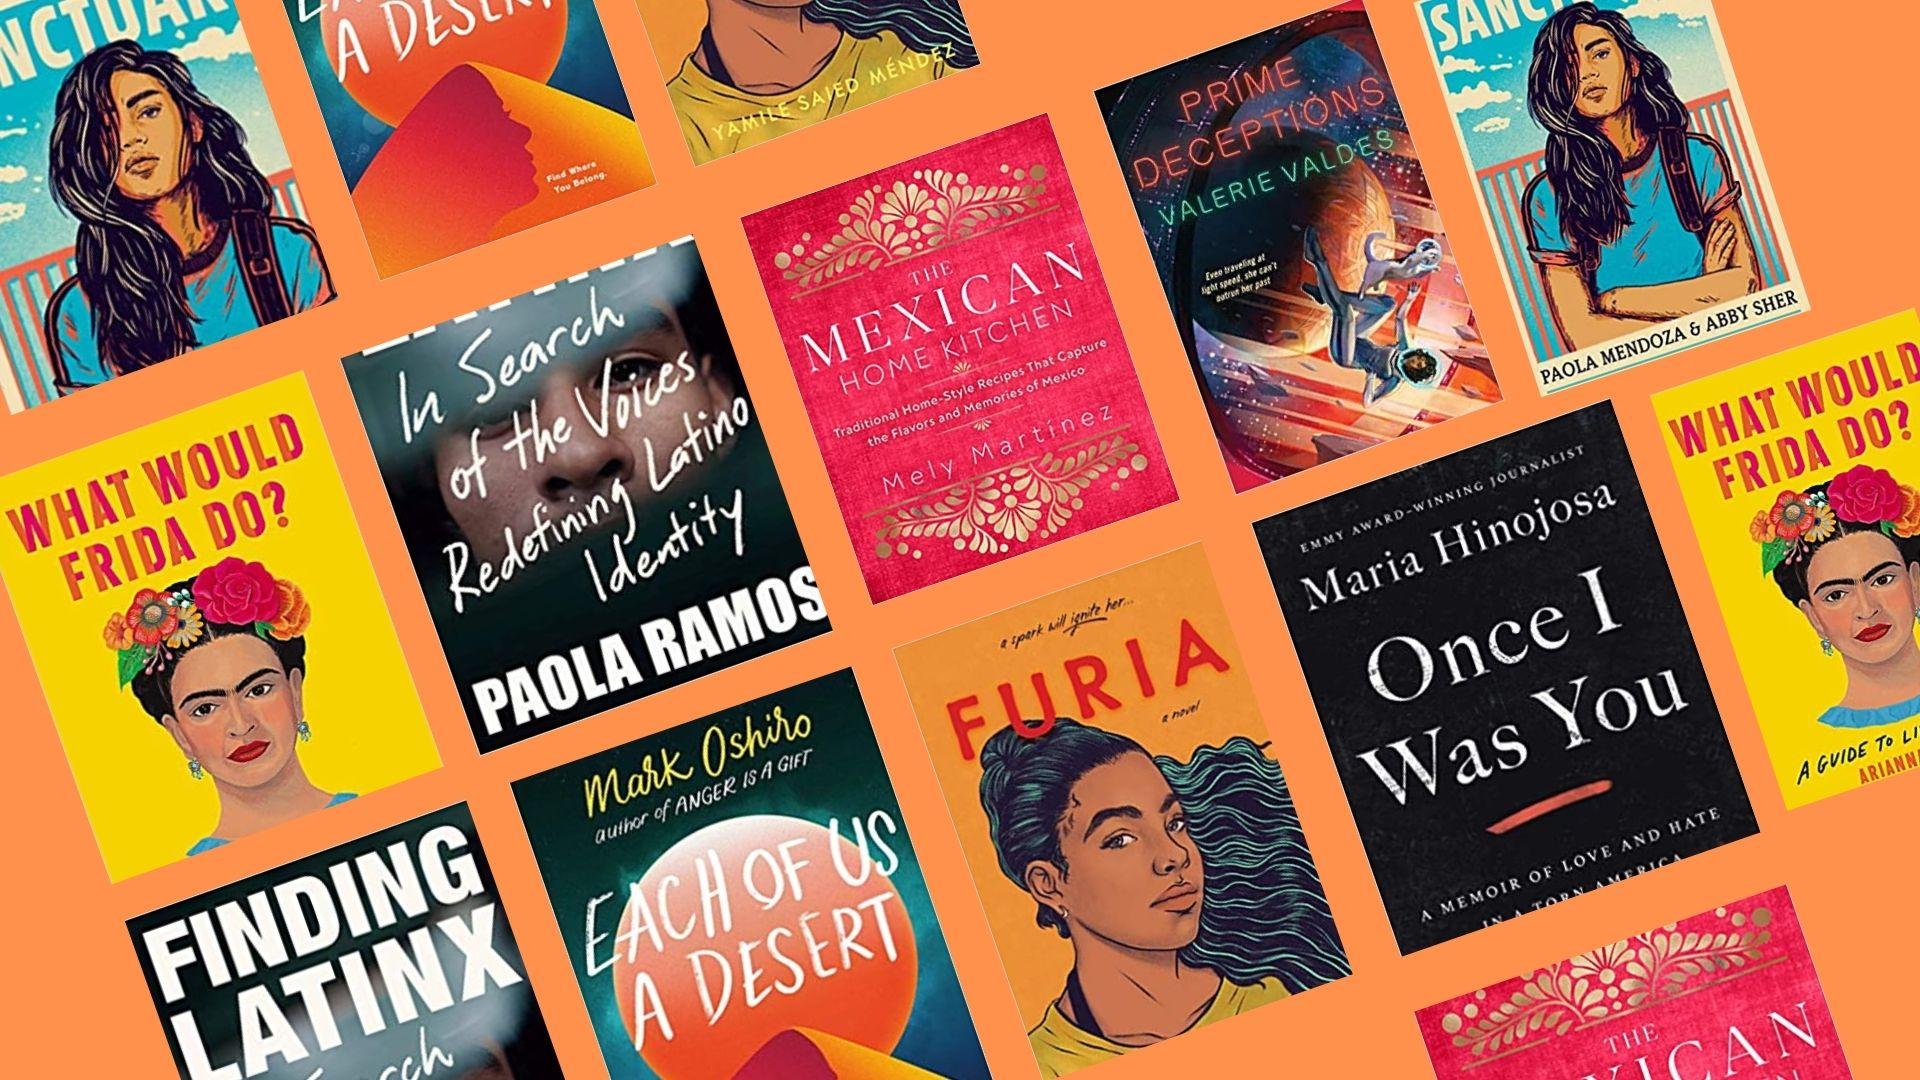 Books by Latino writers